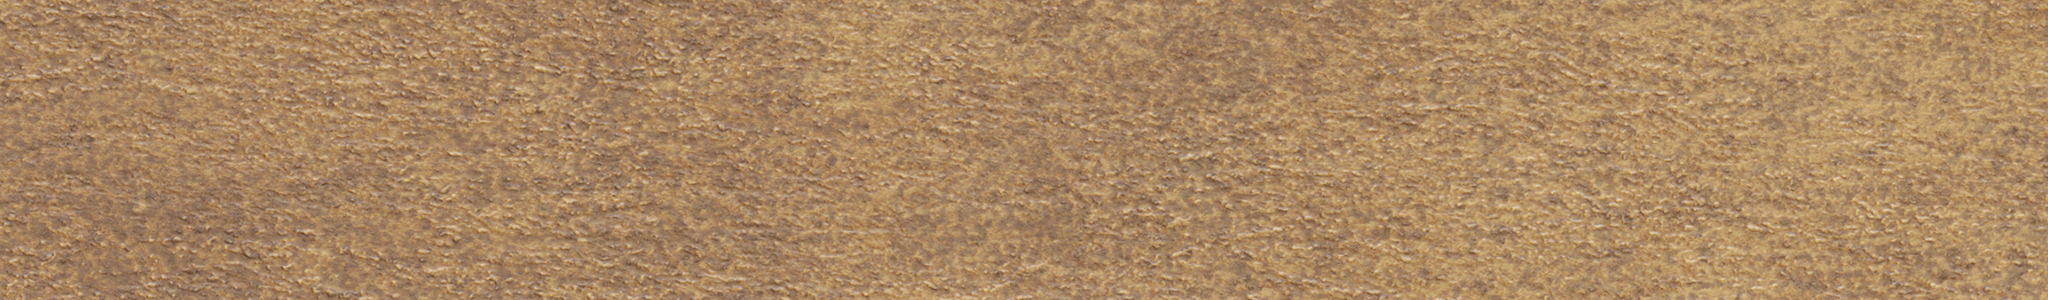 HD 290761 Кромка ABS Сьерра Голд